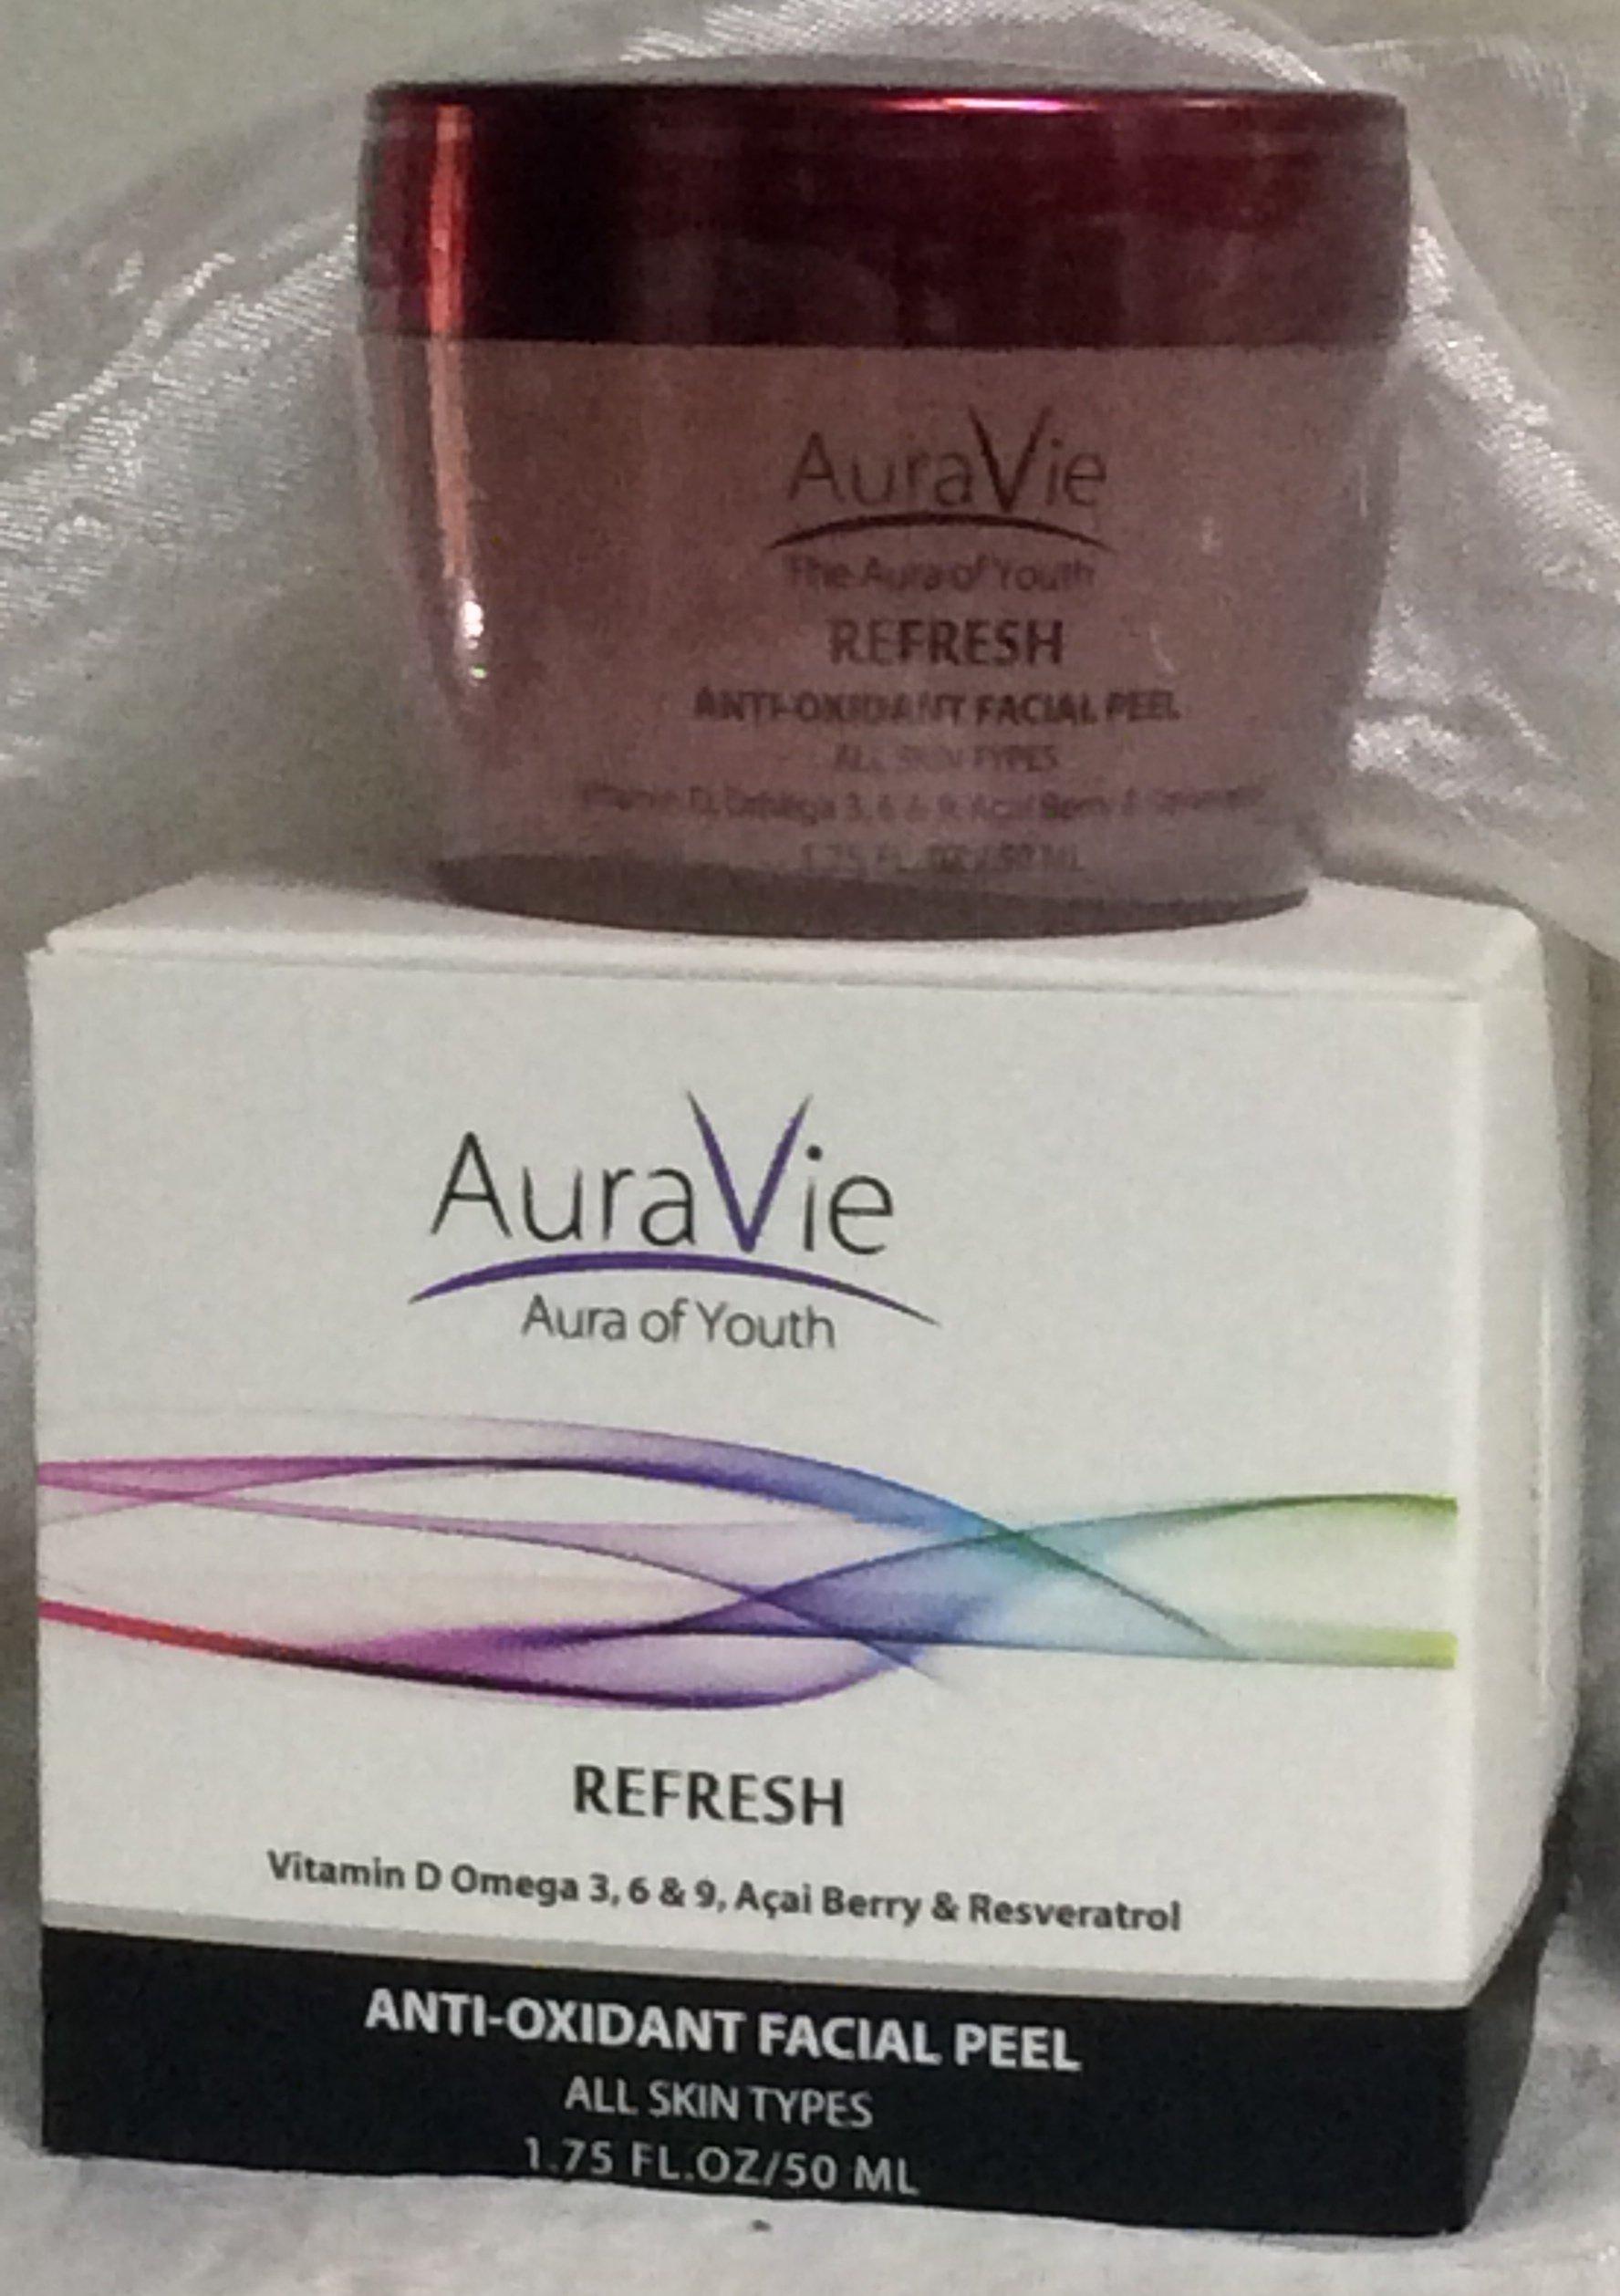 AuraVie REFRESH Facial Peel (1.75 FL. OZ/50ml)